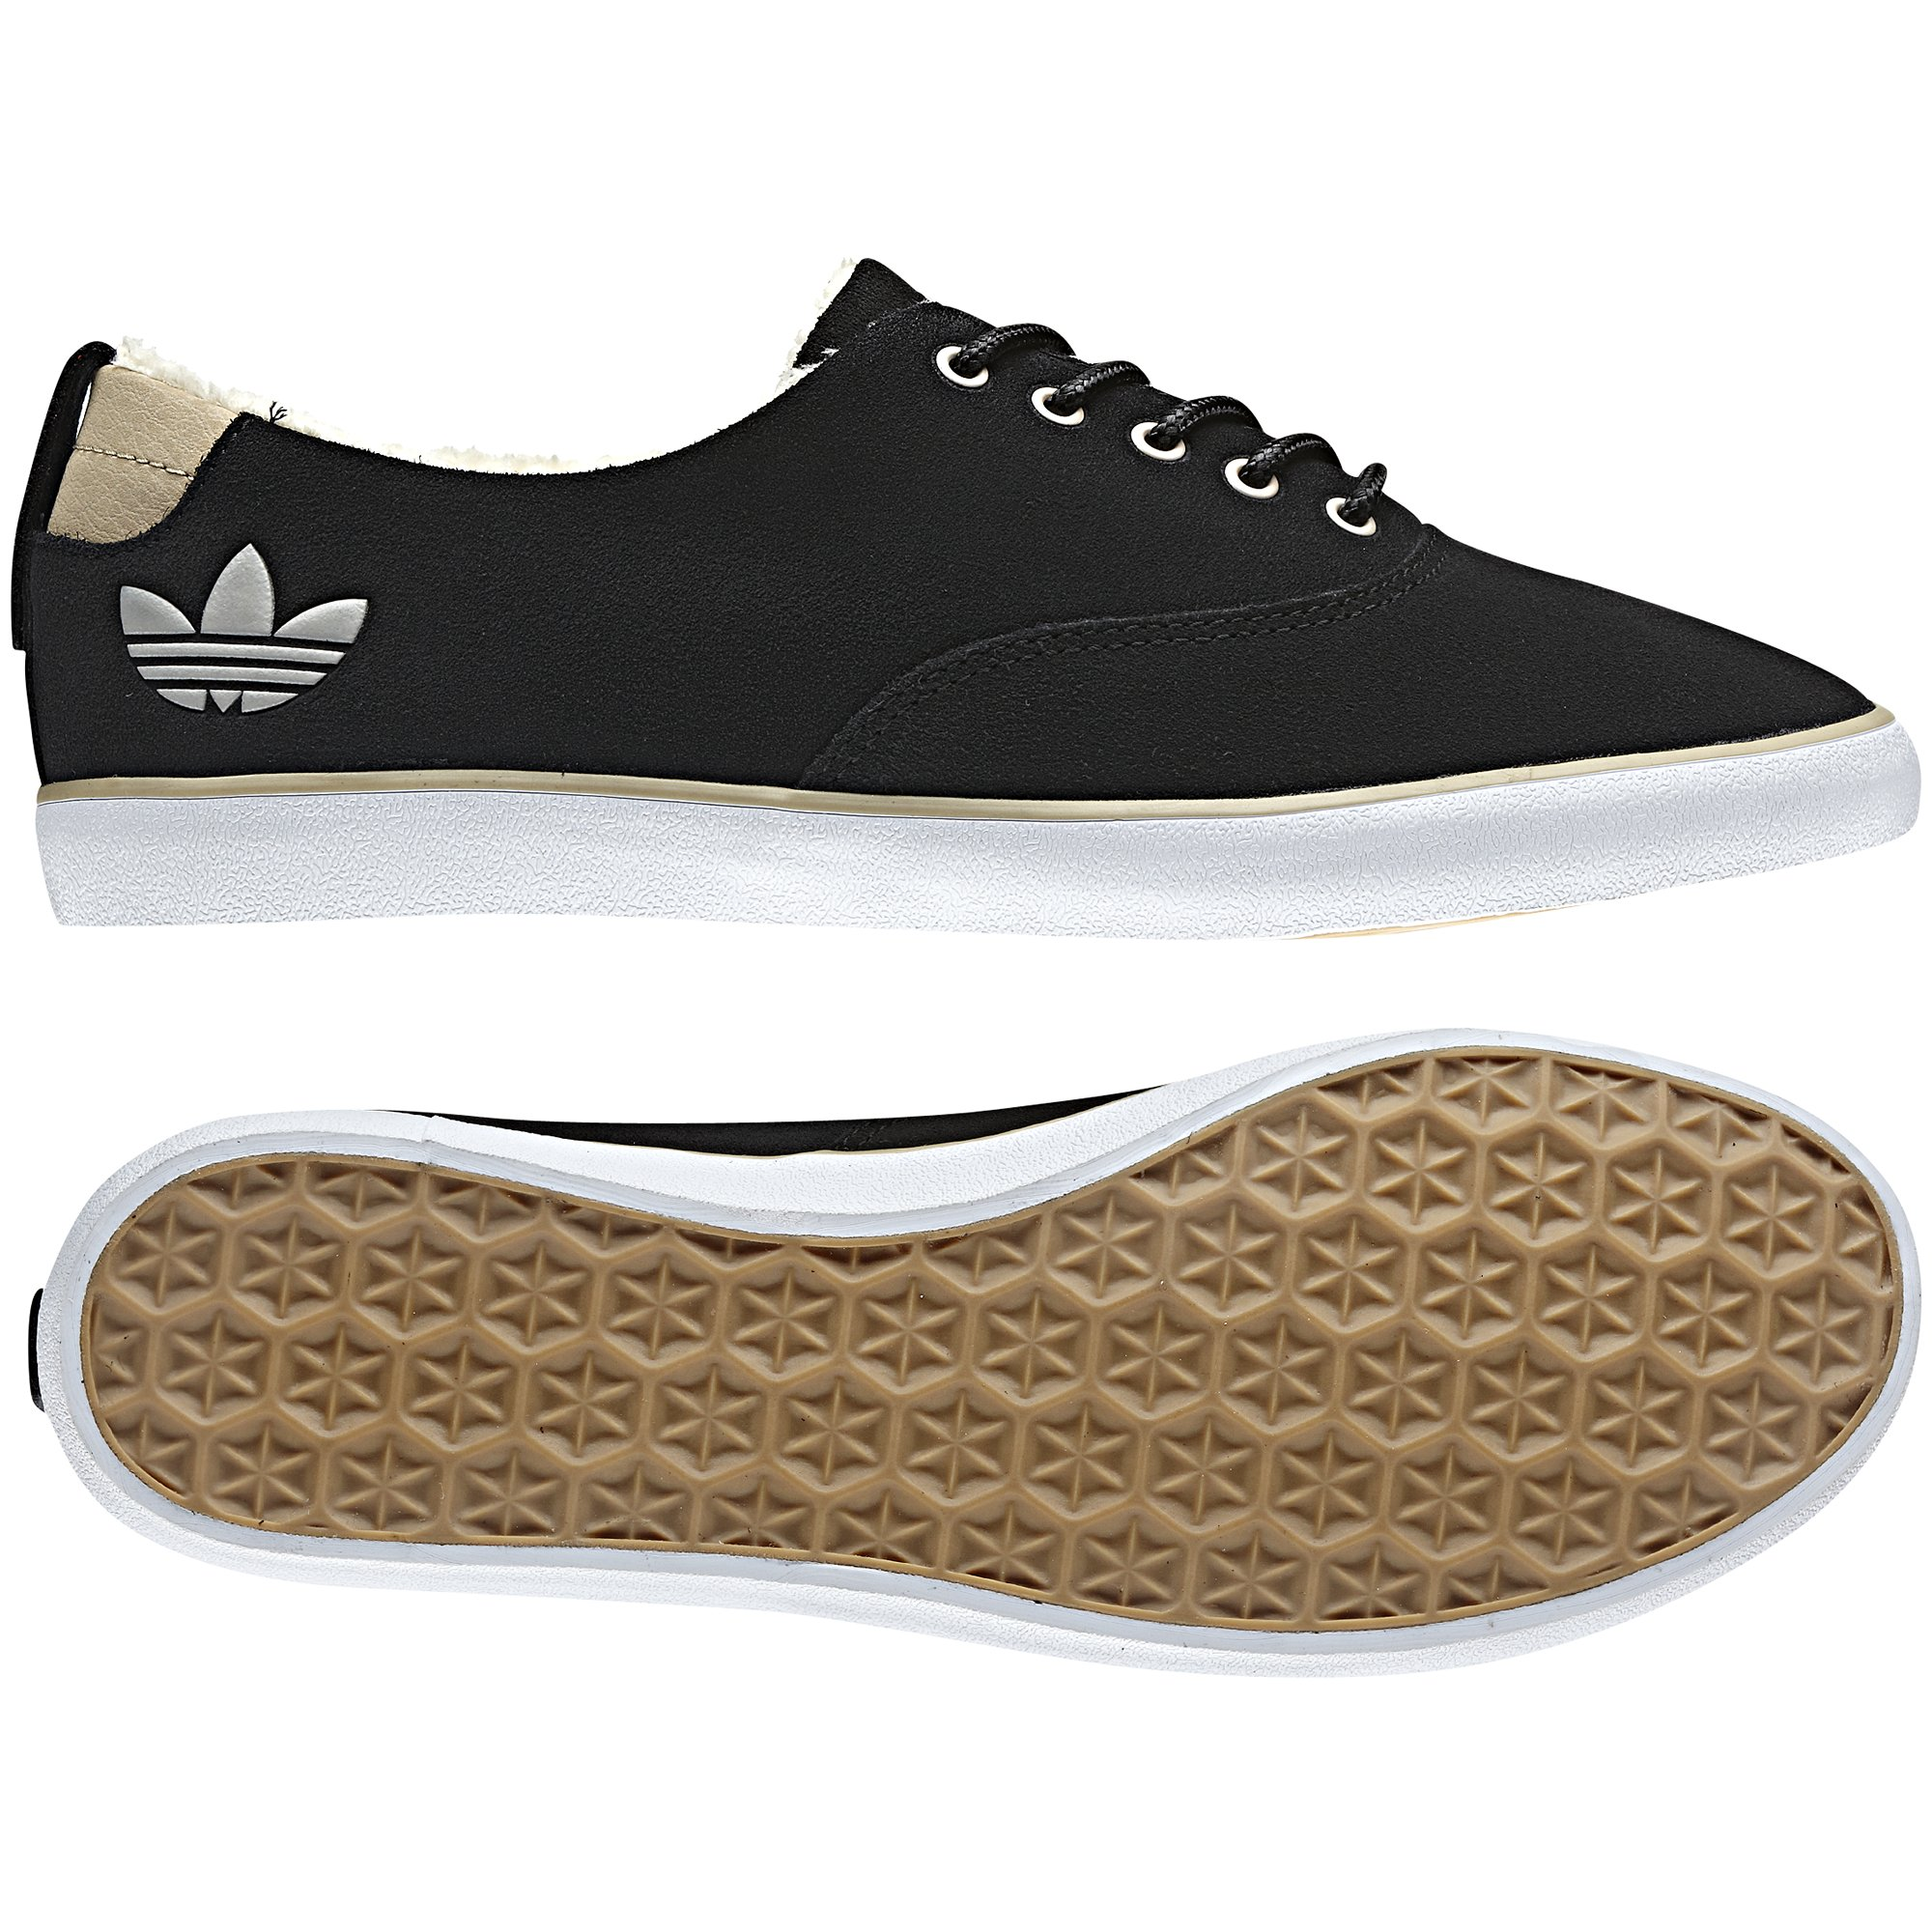 Chaussures Femme Adidas Femmes Azurine Low Shoes prix 70